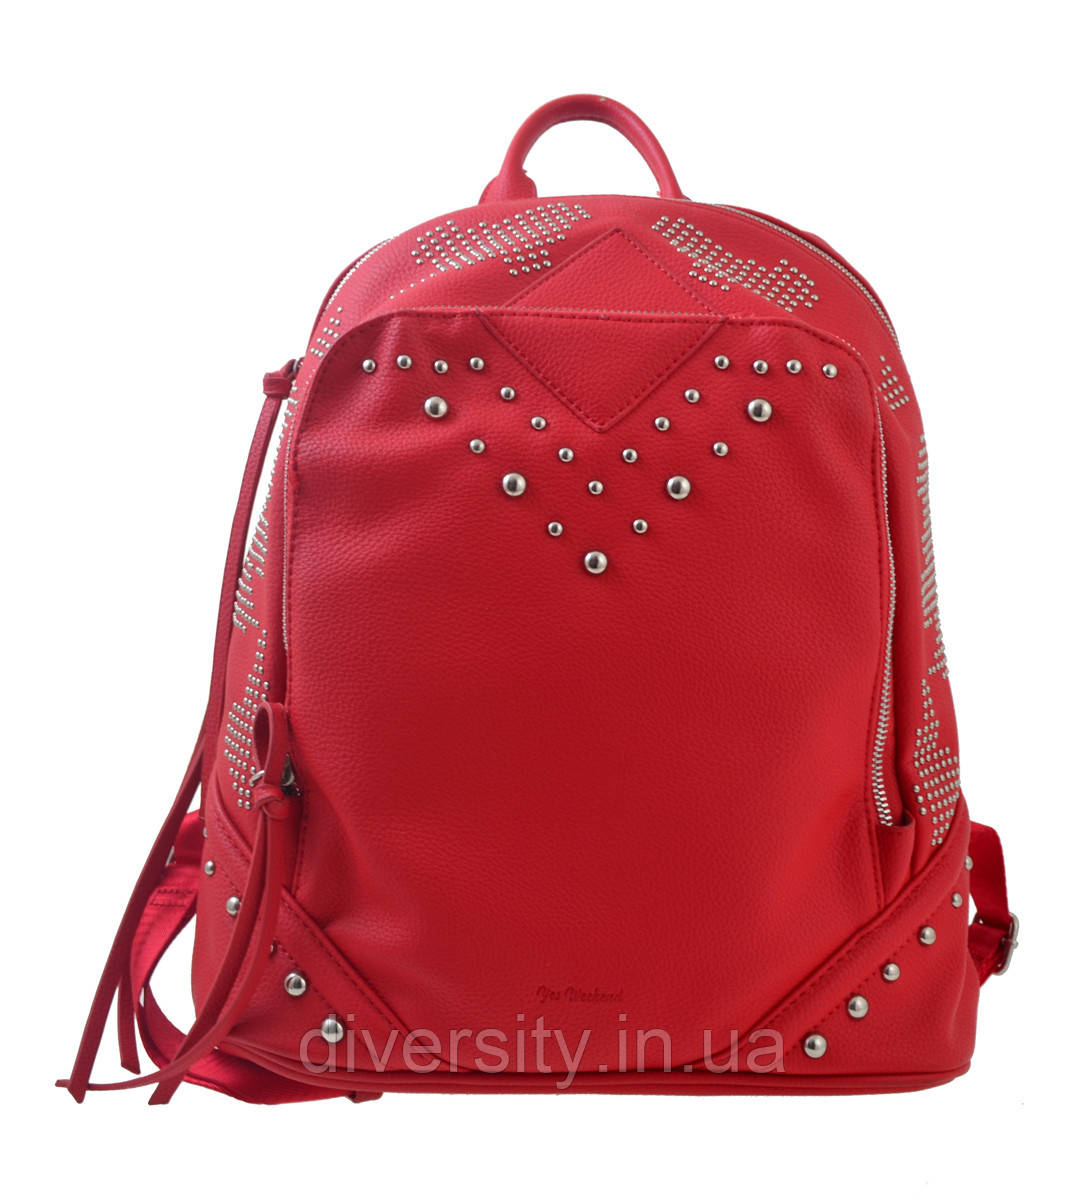 Сумка-рюкзак  YES,  красный,  29*14*33см